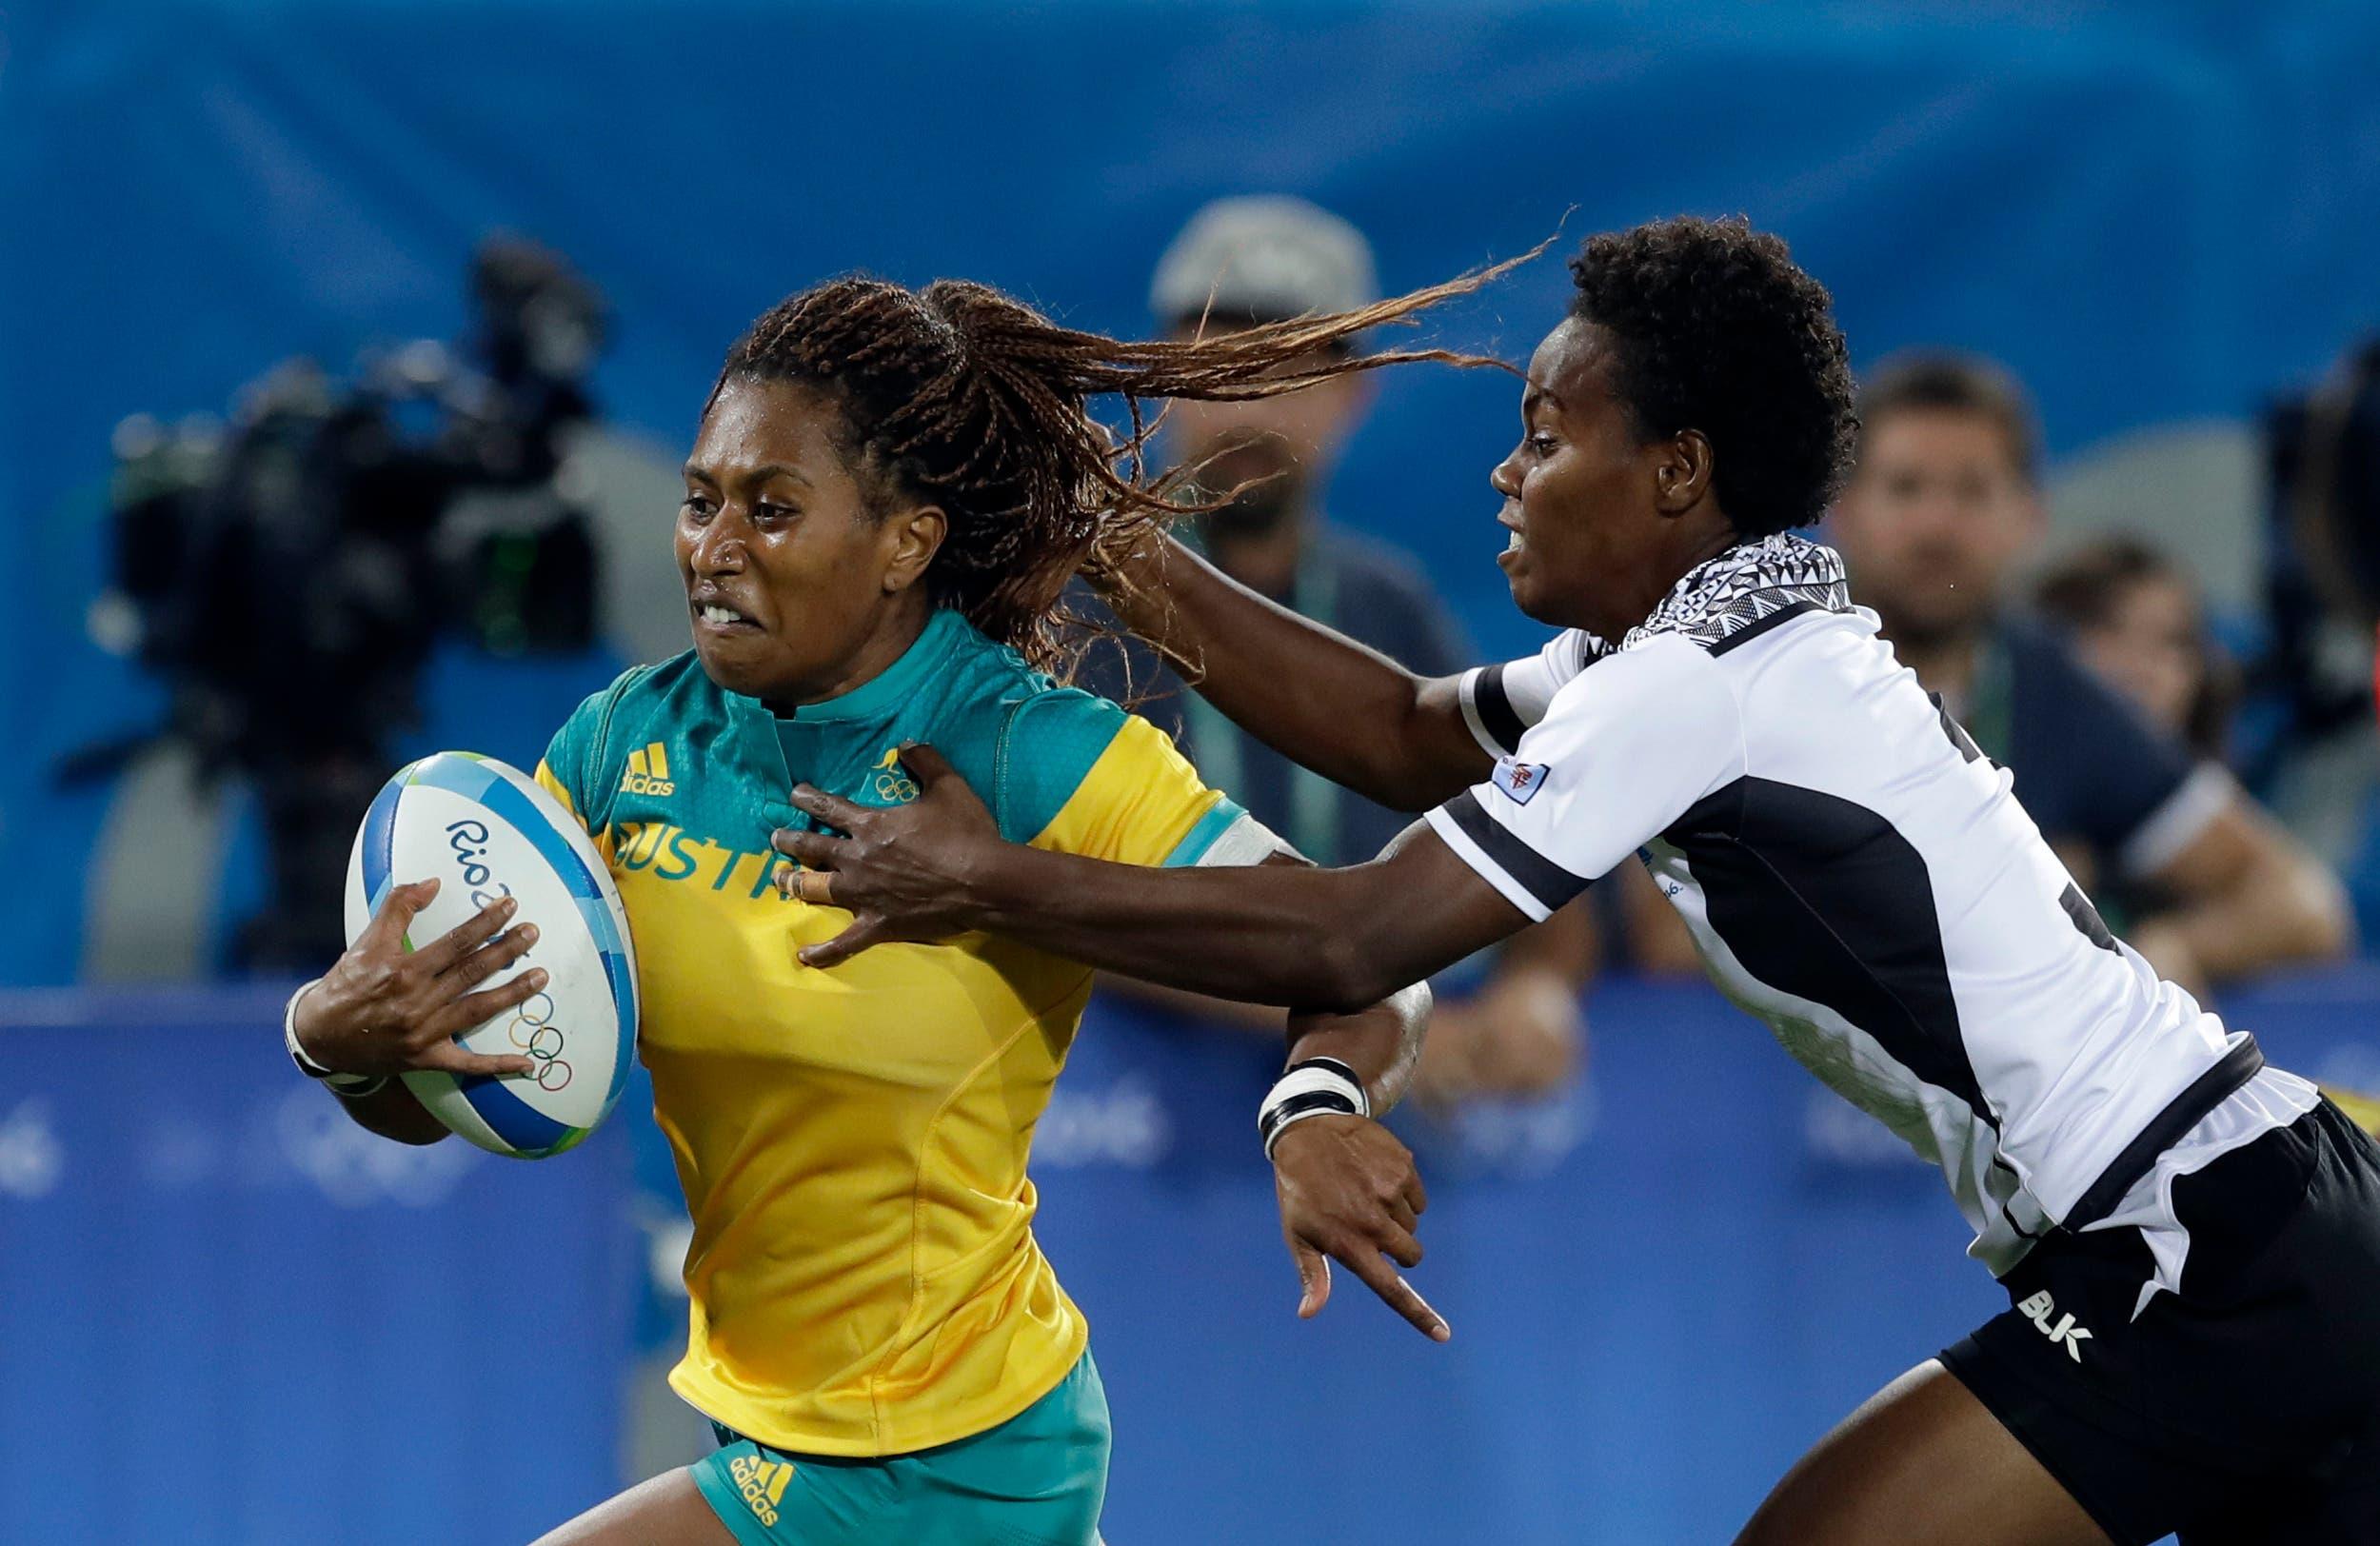 Australia's Ellia Green, left, breaks away from Fiji's Raijieli Daveua, during the women's rugby sevens match between Australia and Fiji (Photo: AP)